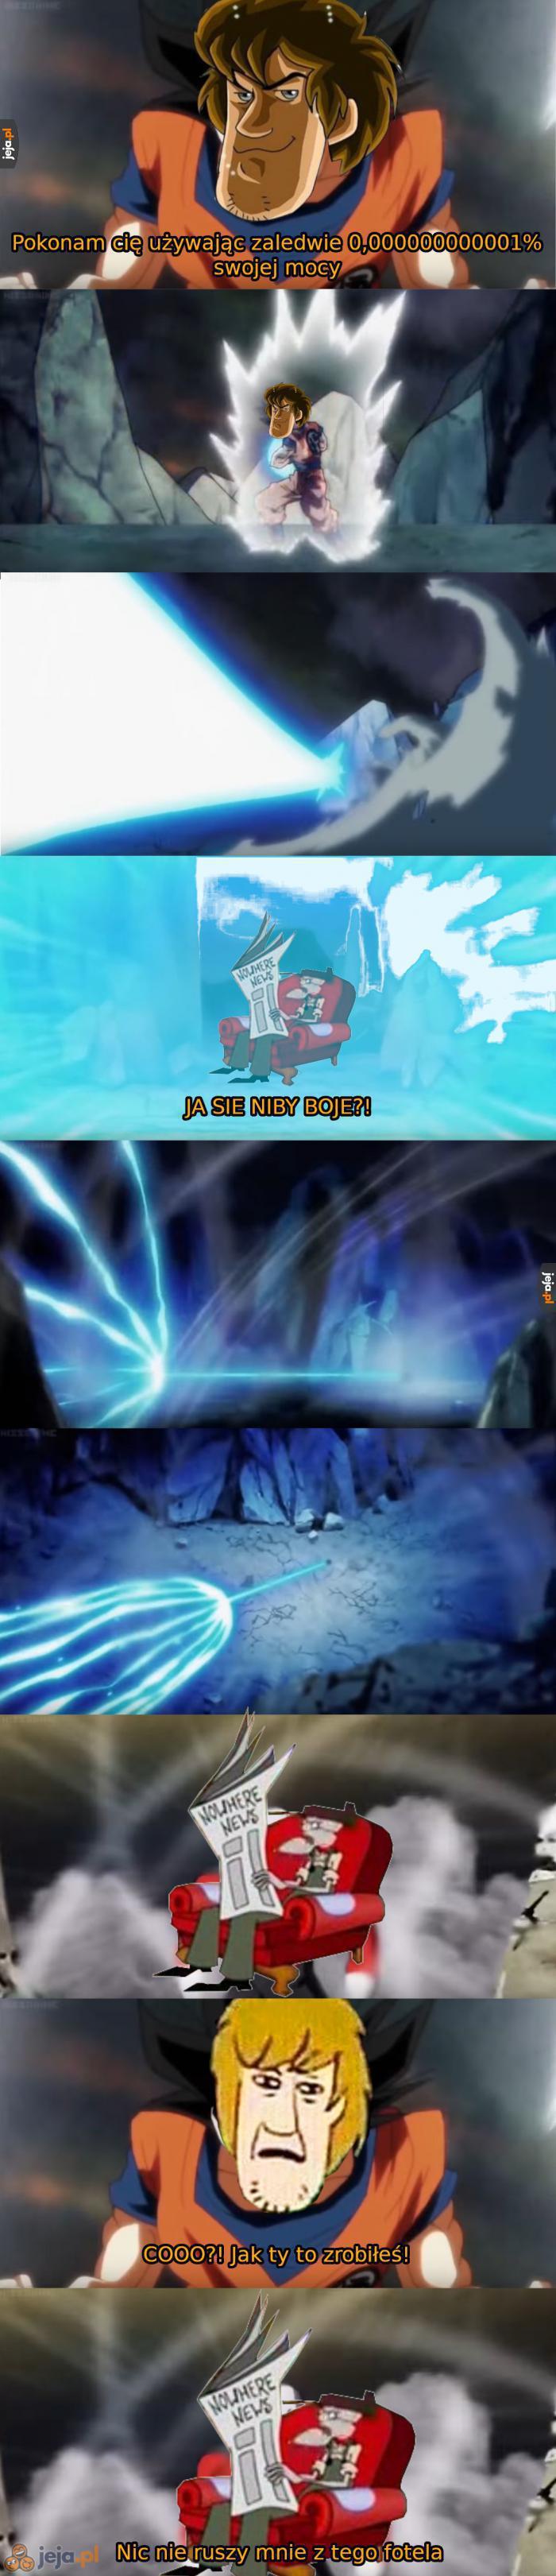 Legendarna bitwa